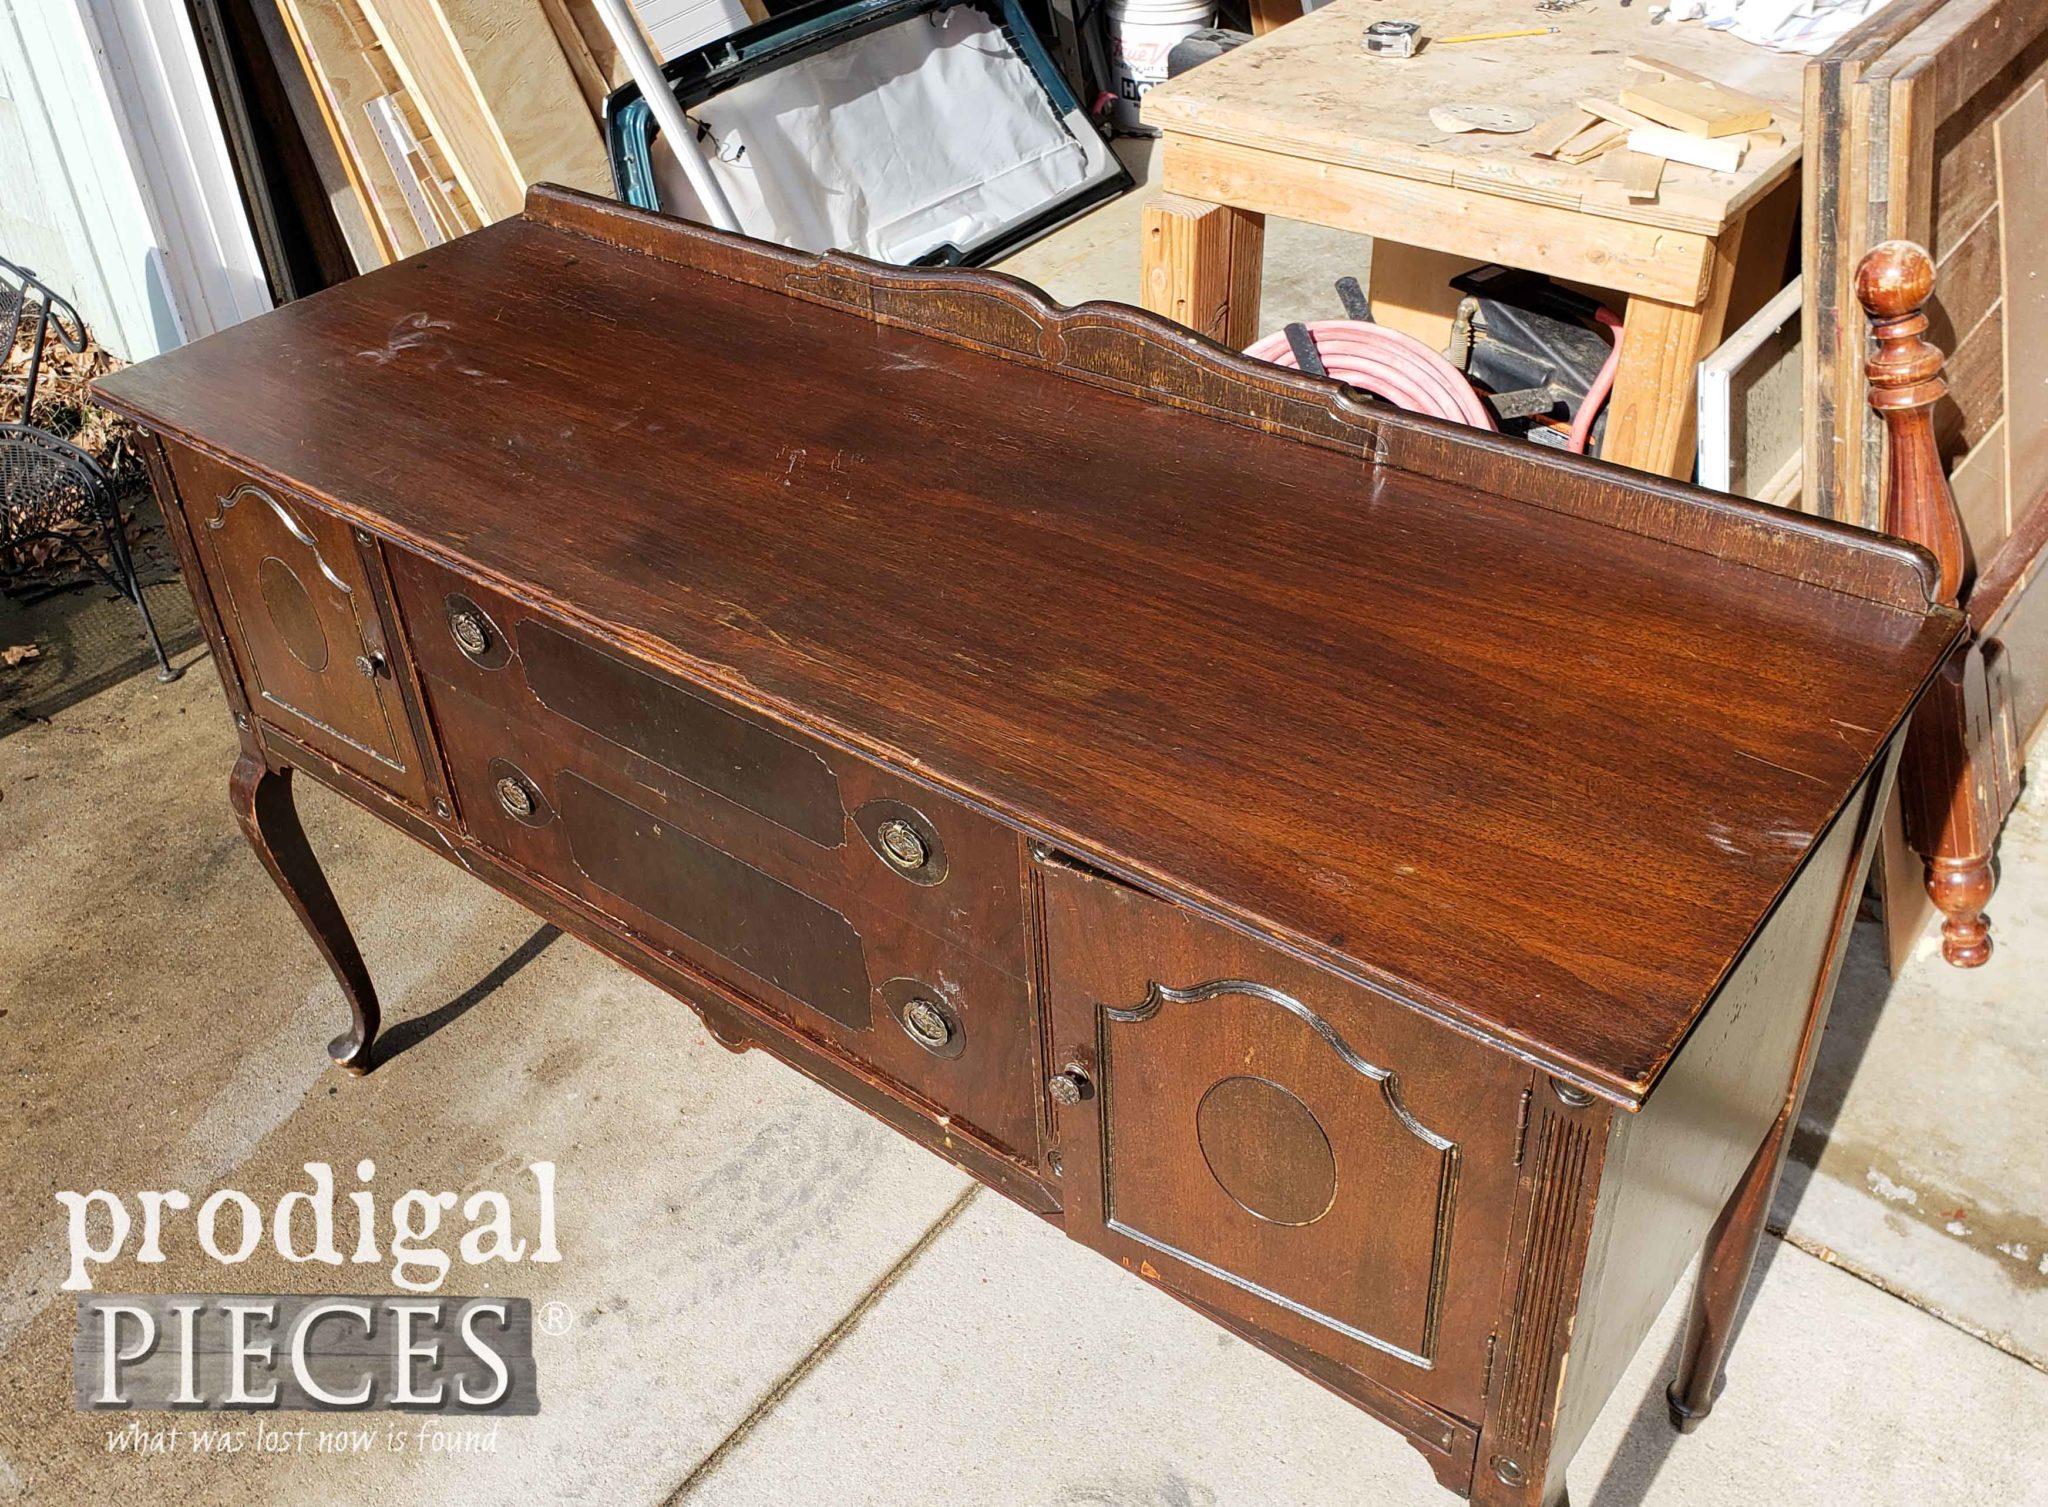 Damaged Antique Buffet Top | prodigalpieces.com